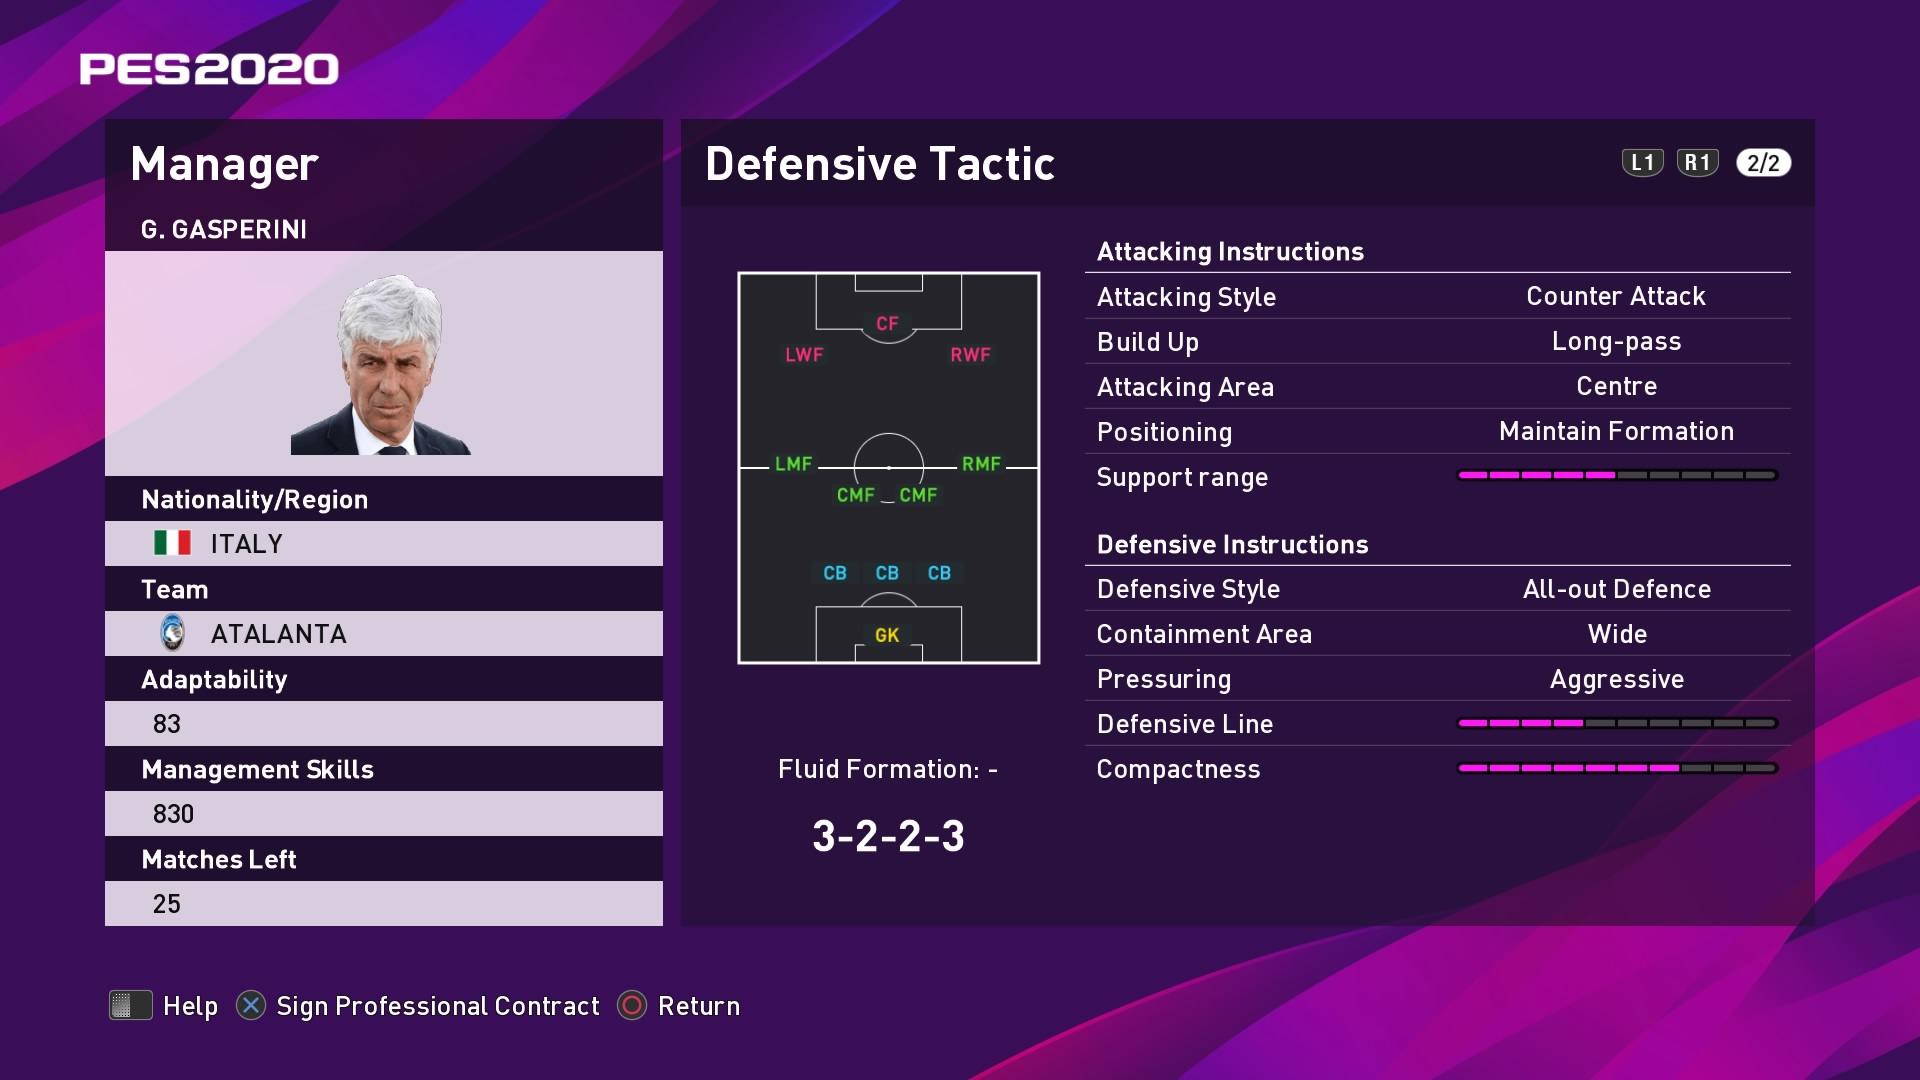 G. Gasperini (2) (Gian Piero Gasperini) Defensive Tactic in PES 2020 myClub